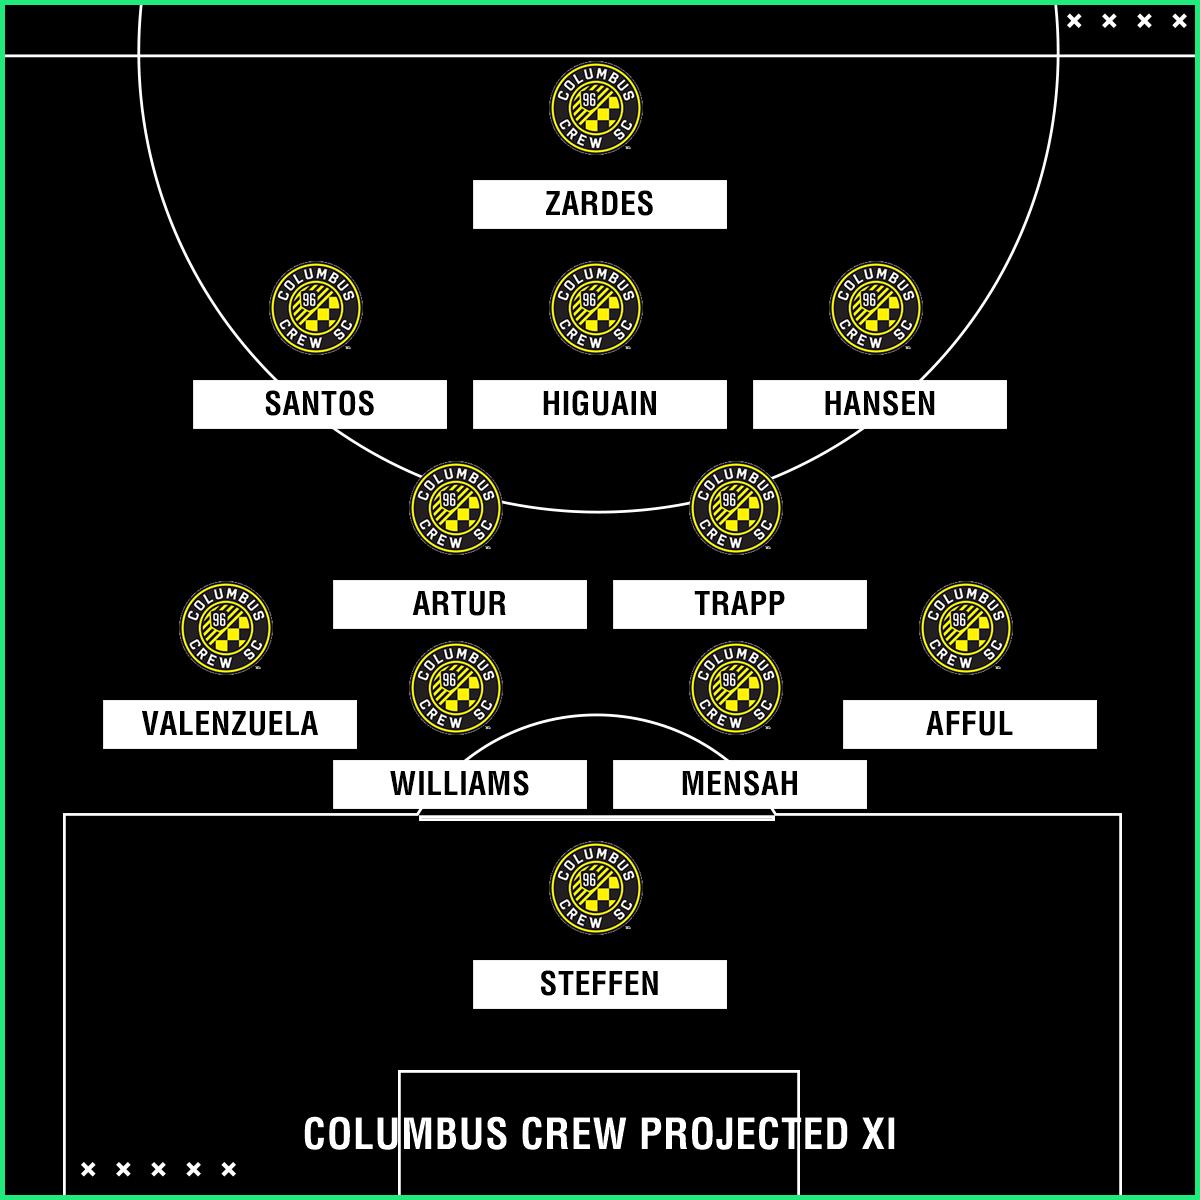 Columbus Crew projected XI